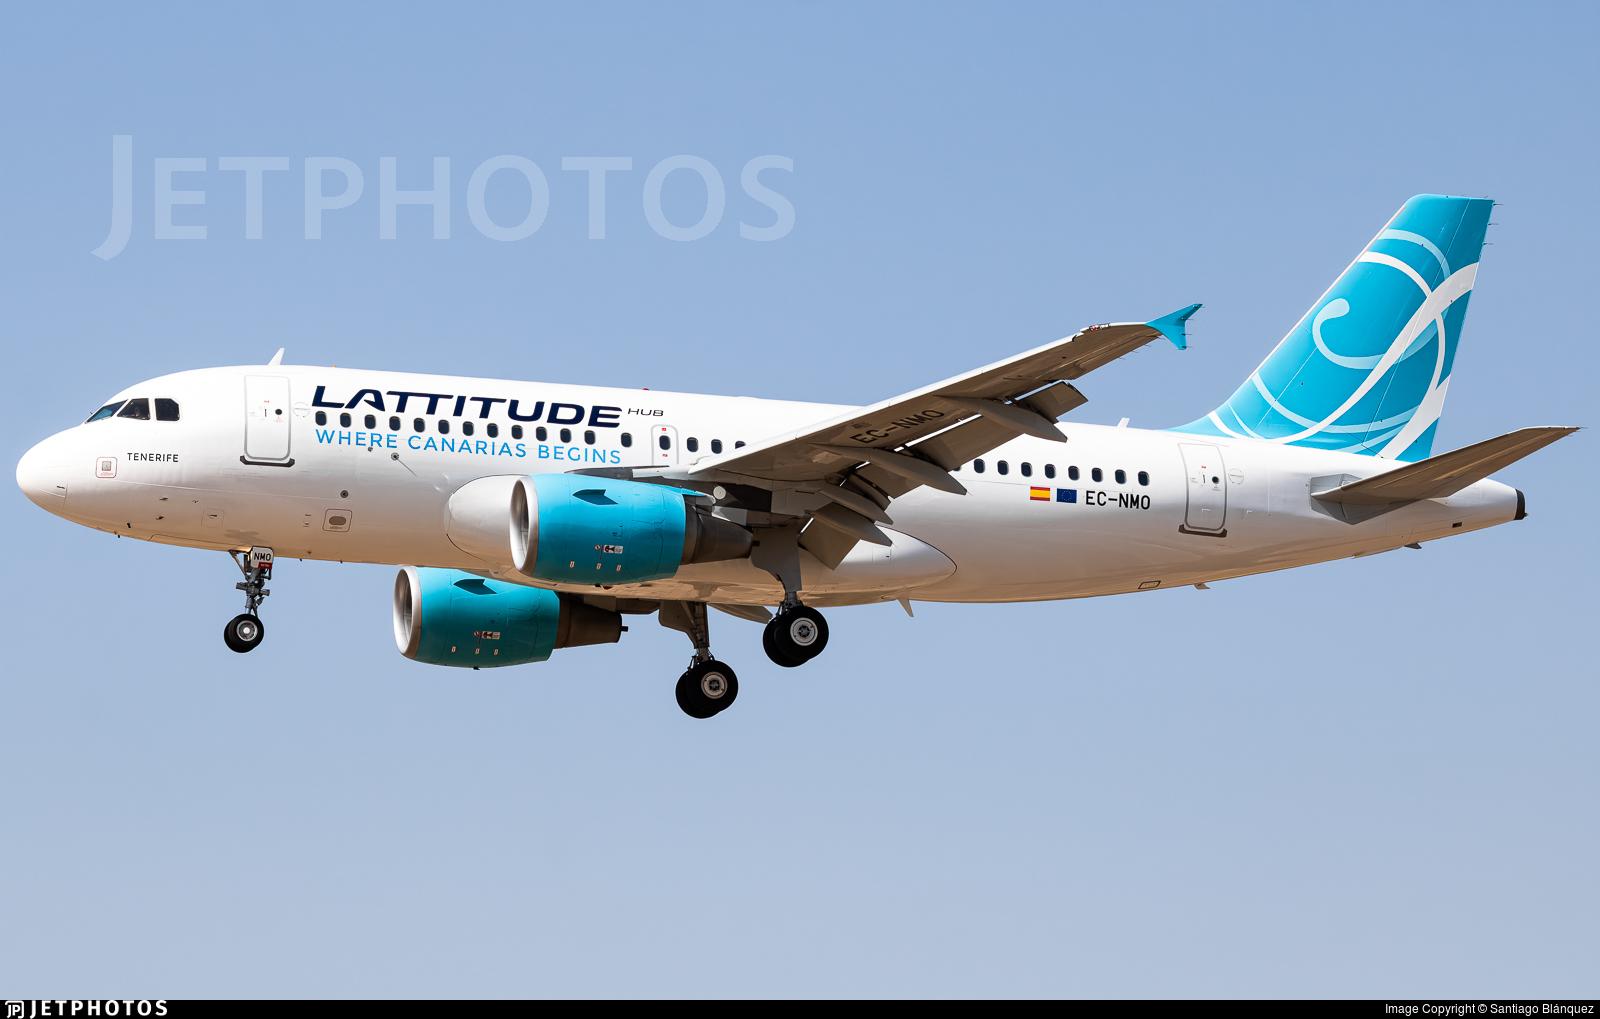 EC-NMO - Airbus A319-115 - Lattitude Hub (One Airways)